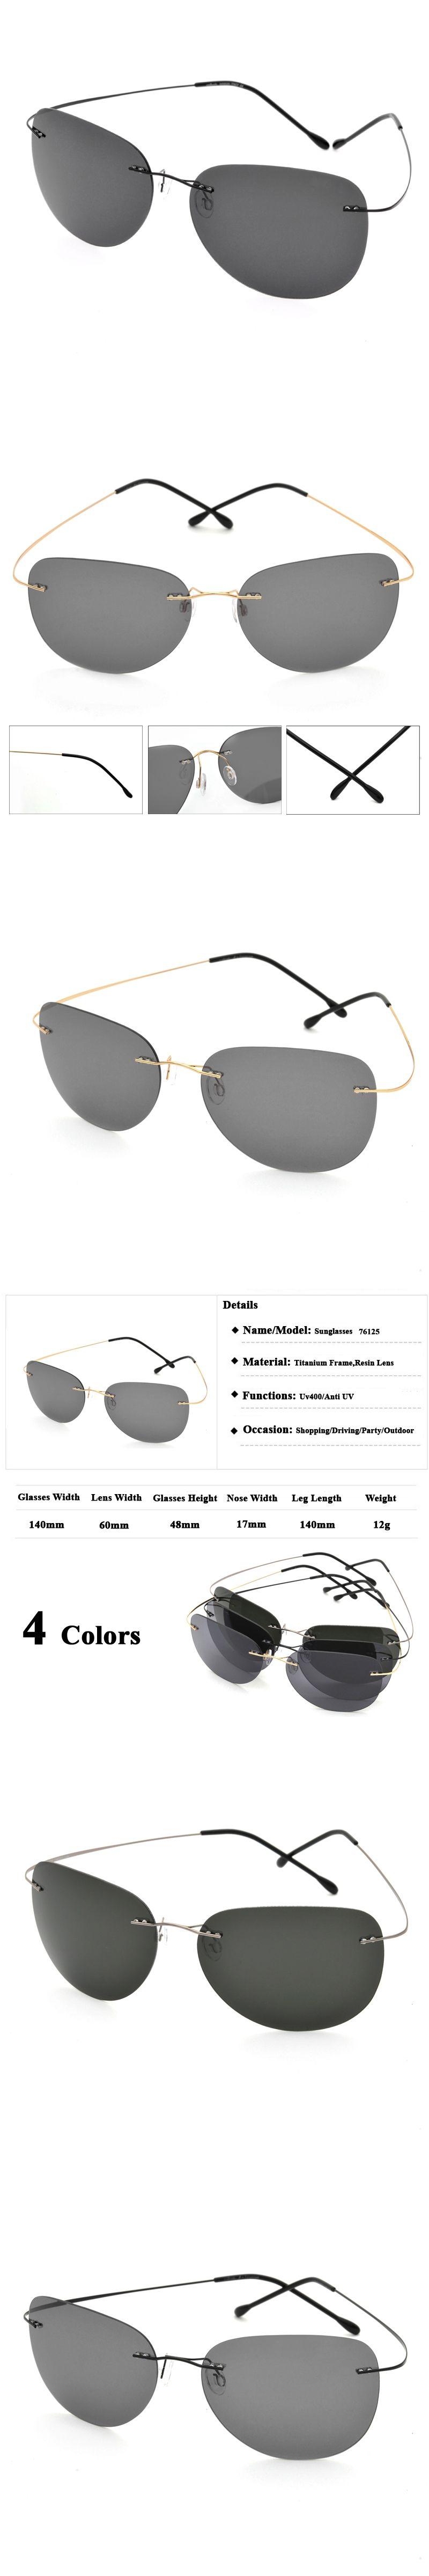 bf1f8d9736 Clearance Sale Item Titanium Alloy Rimless Polarized Sunglasses Ultralight  Super Light Men Mirror Designer Sun Glass